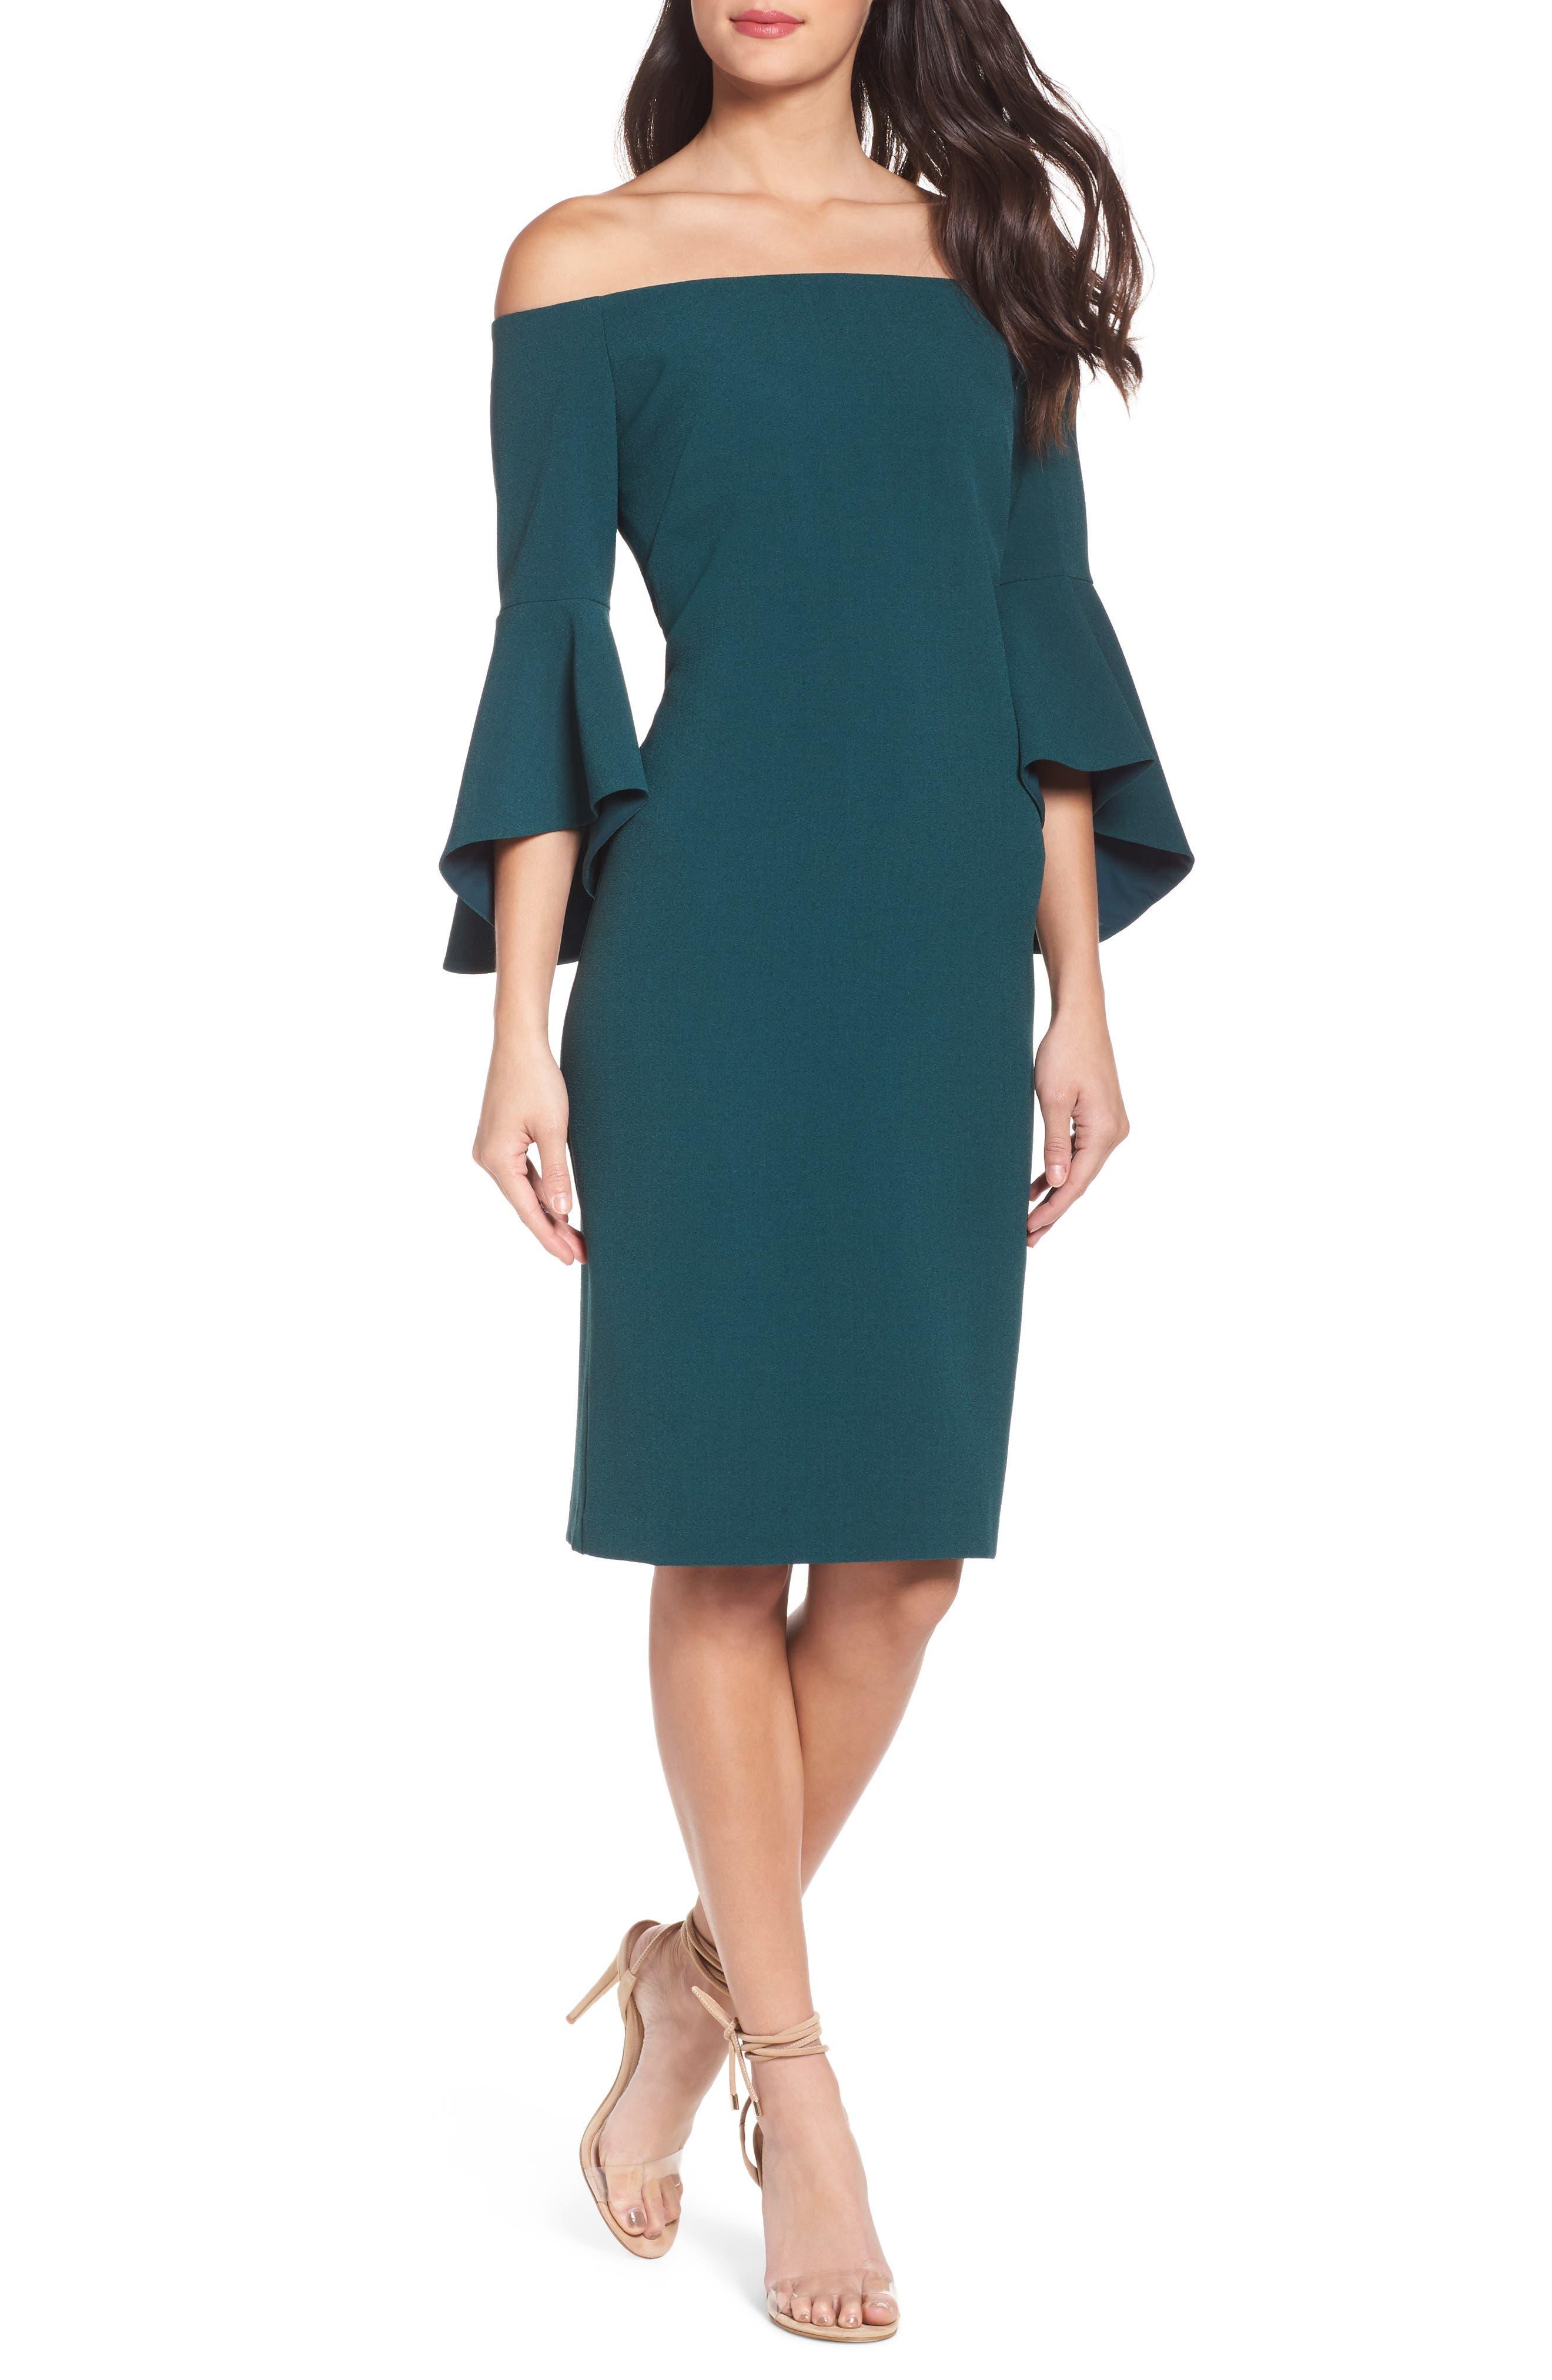 Green 3/4 Sleeve Dresses